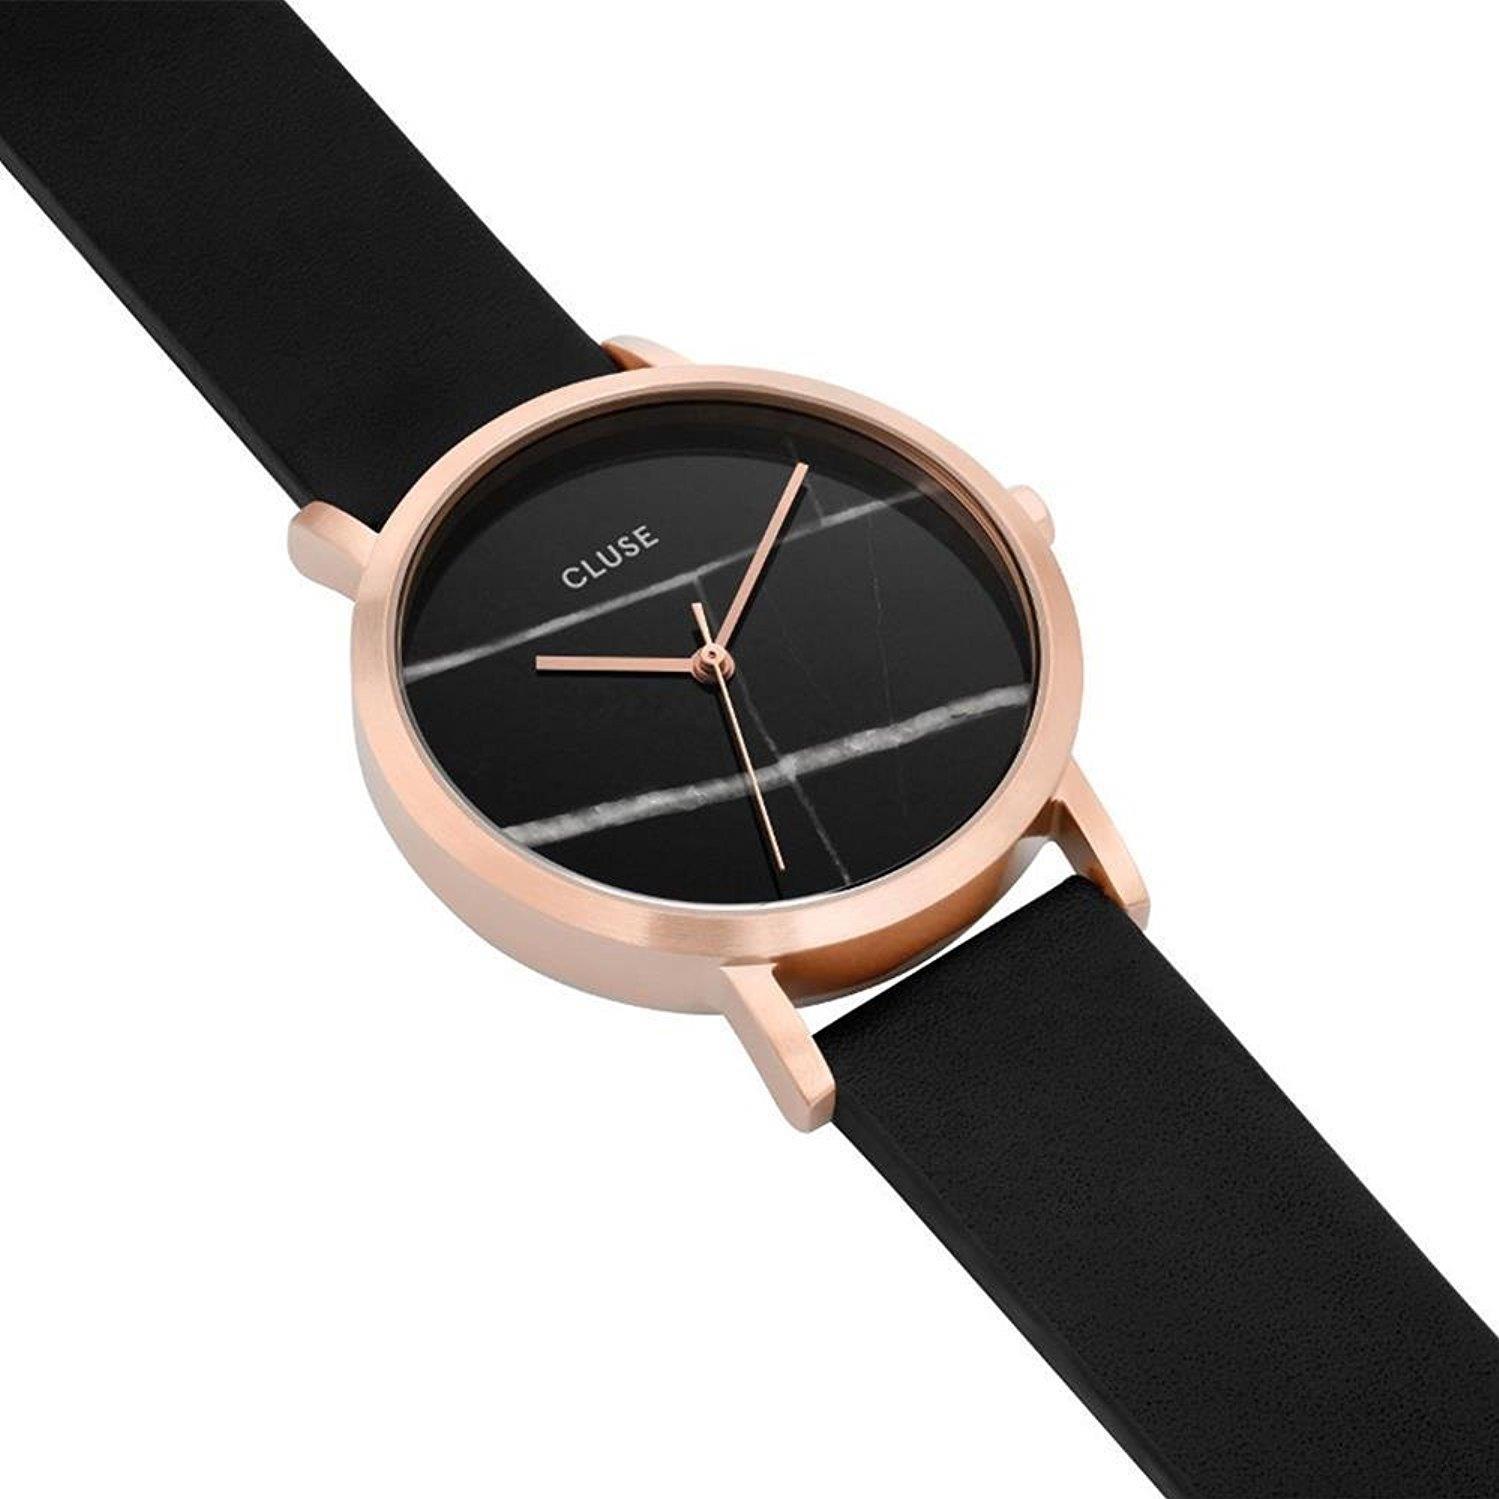 Amazon.com: CLUSE La Roche Petite Rose Gold Black Marble Black CL40104 Womens Watch 33mm Leather Strap Minimalistic Design Casual Dress Japanese Quartz: ...